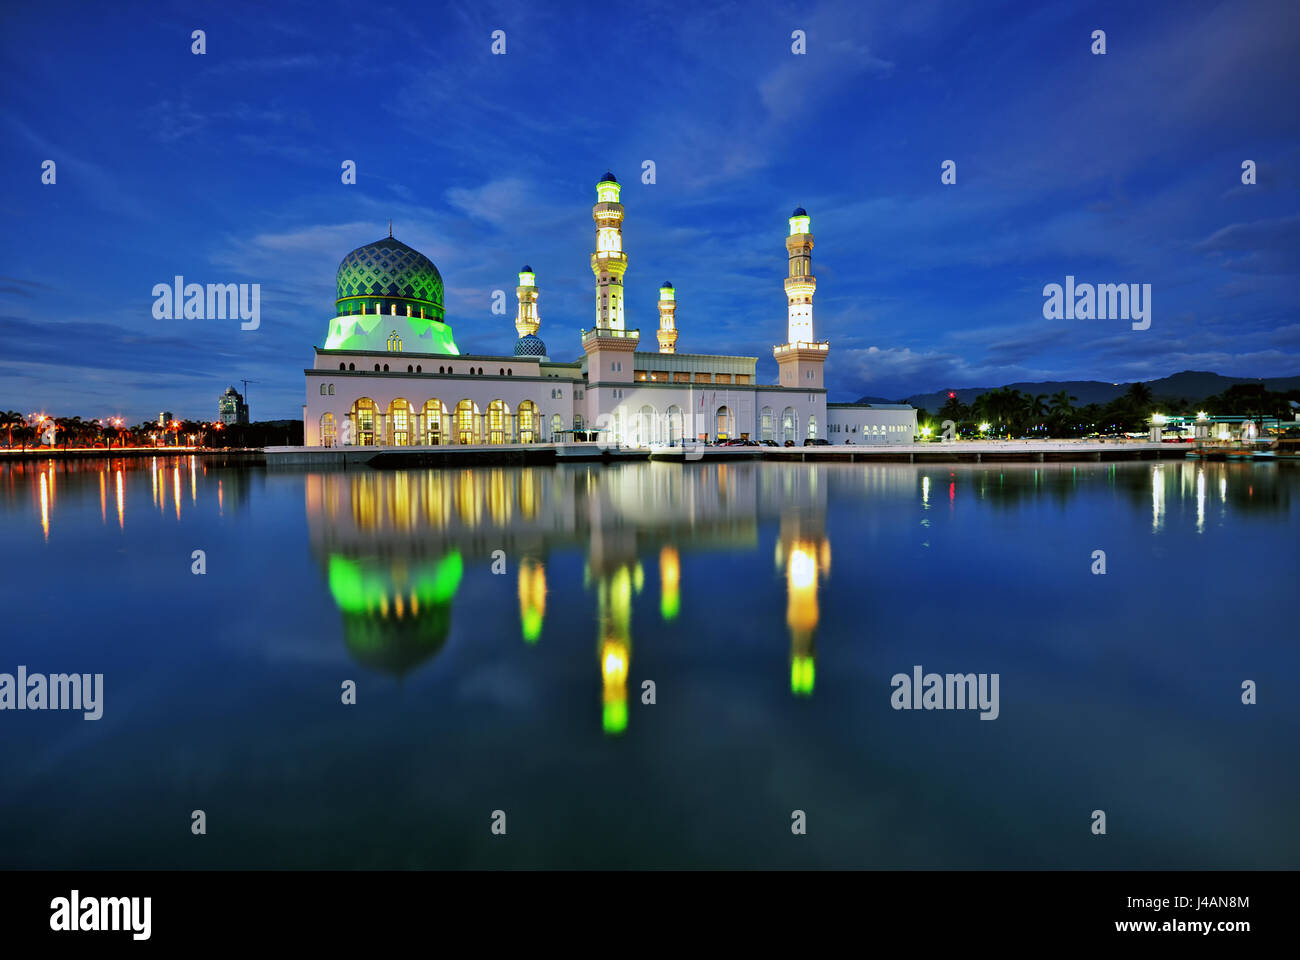 Night scene of Kota Kinabalu city Mosque, Sabah Borneo, Malaysia. Stock Photo